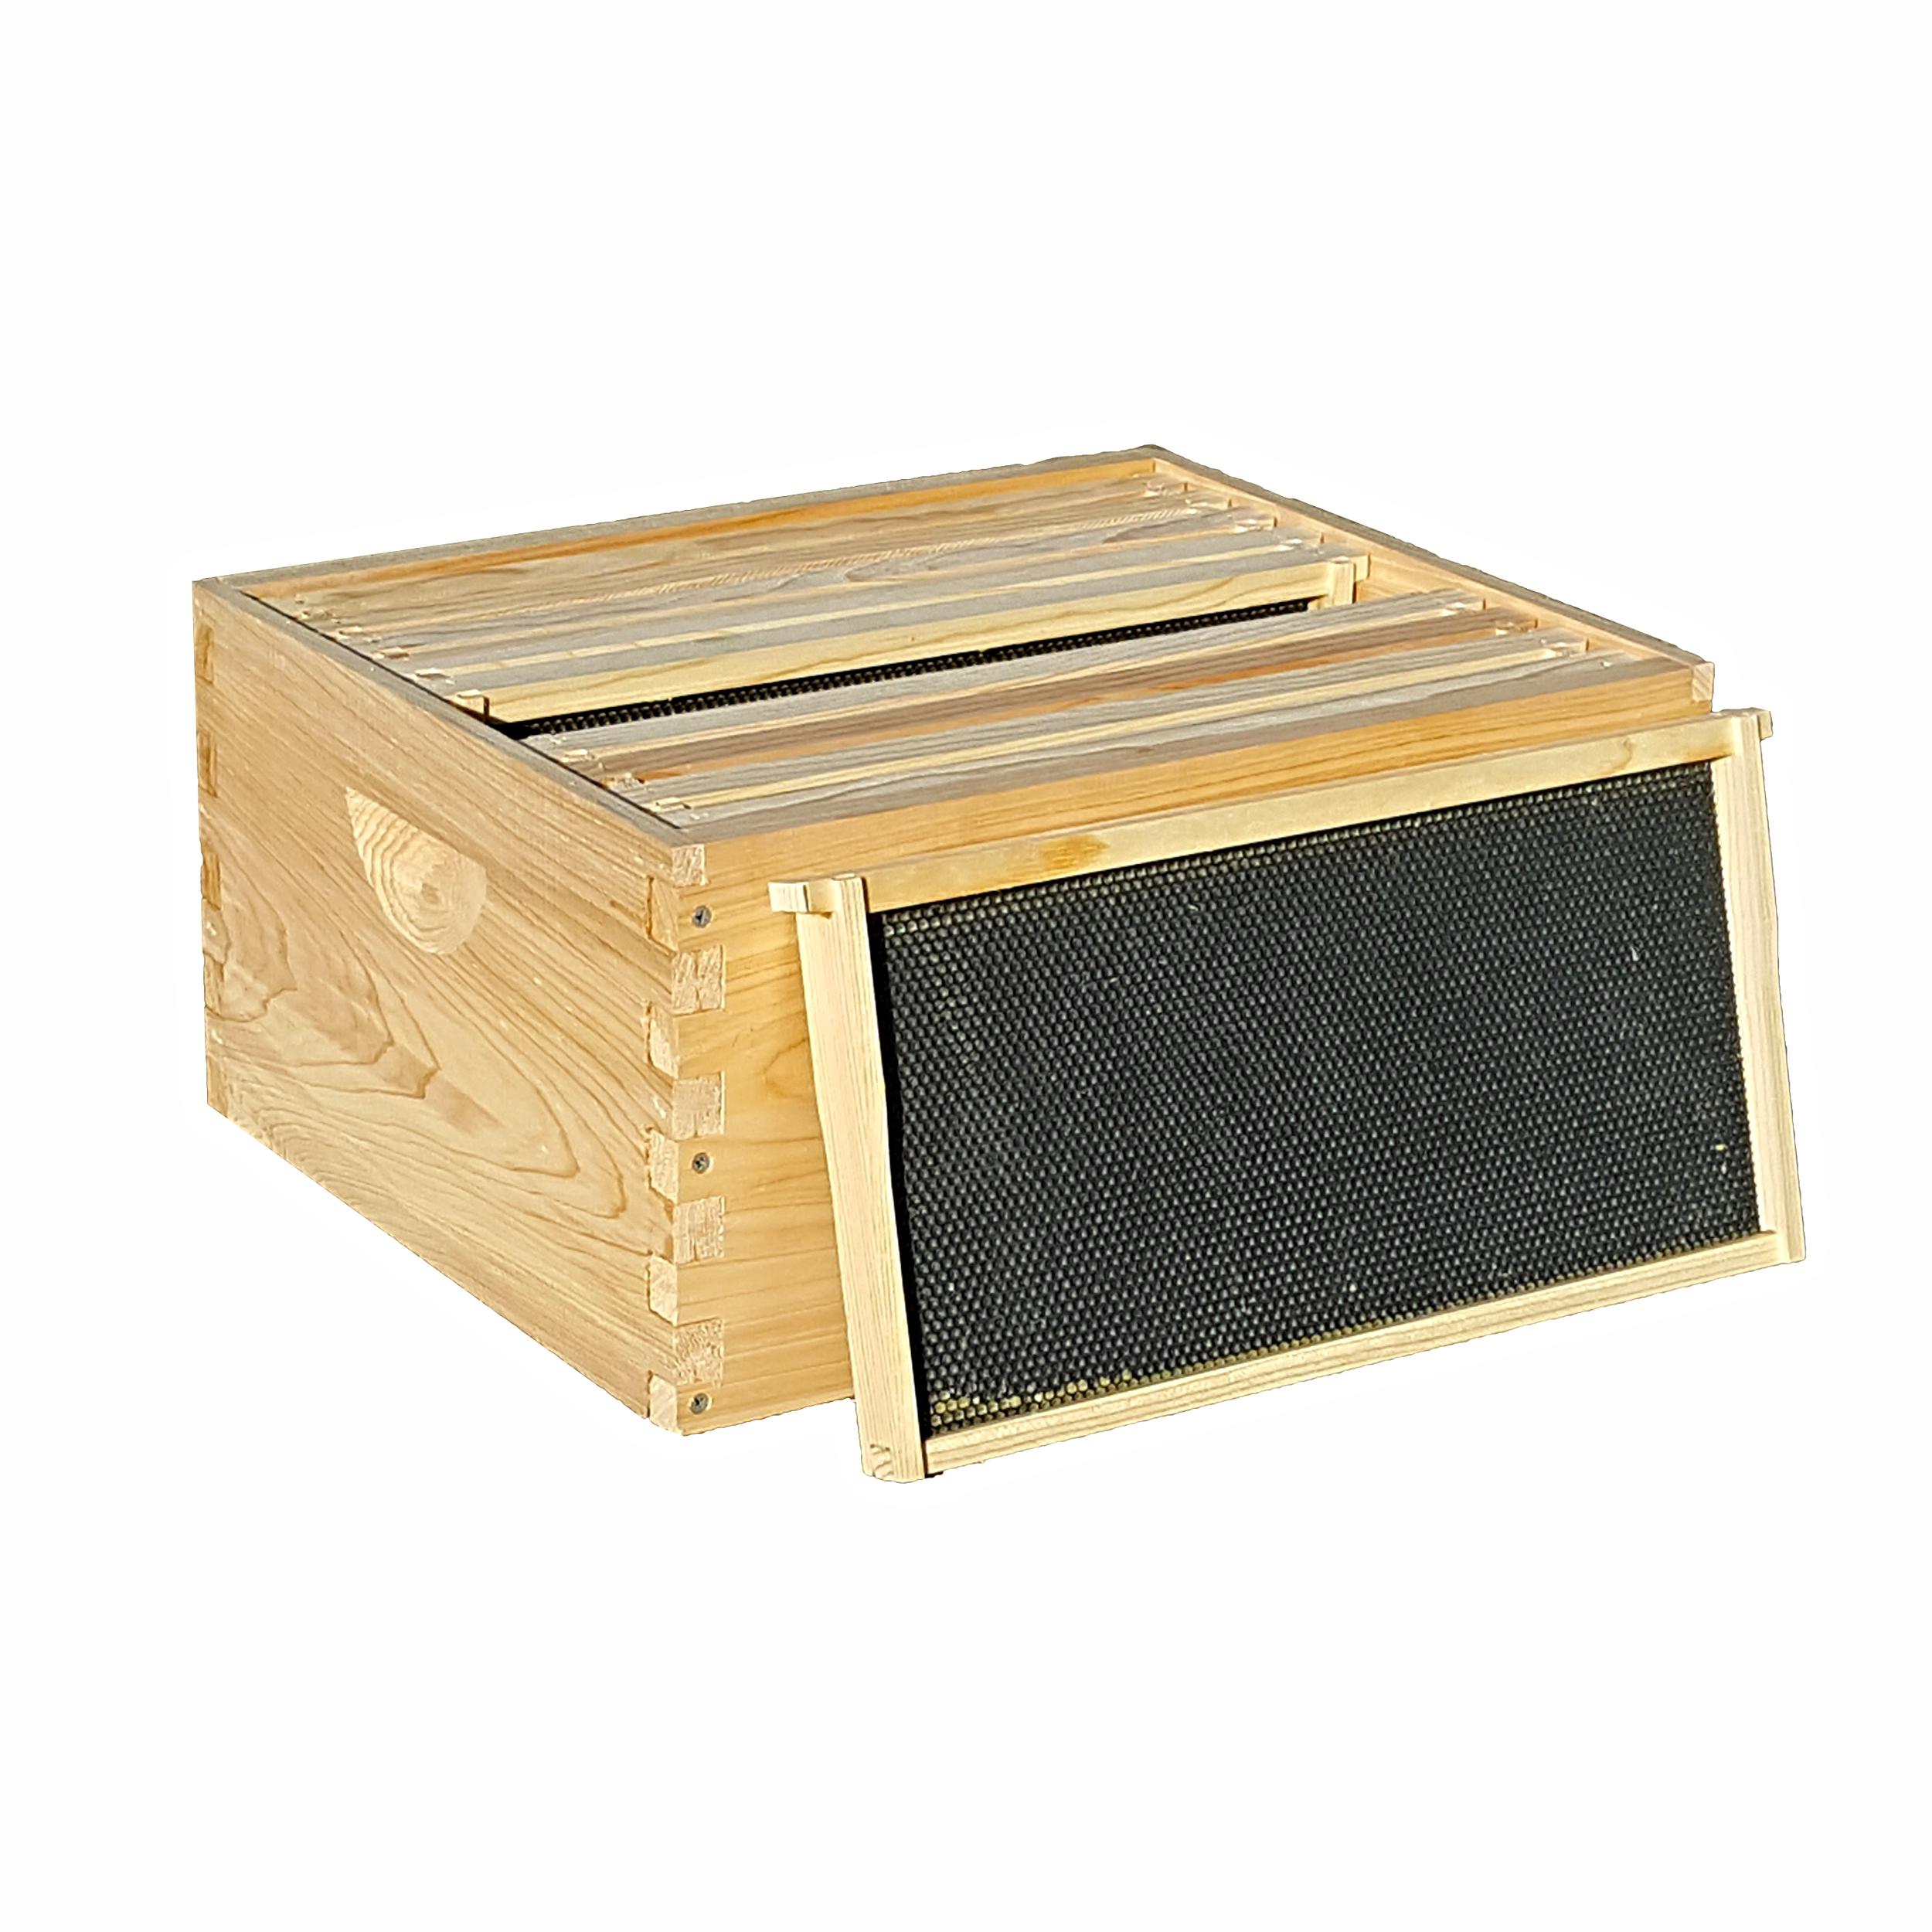 5Frame Medium 6 58 Complete Nuc Bee Hive wFrames /& Foundations Un-Assembled